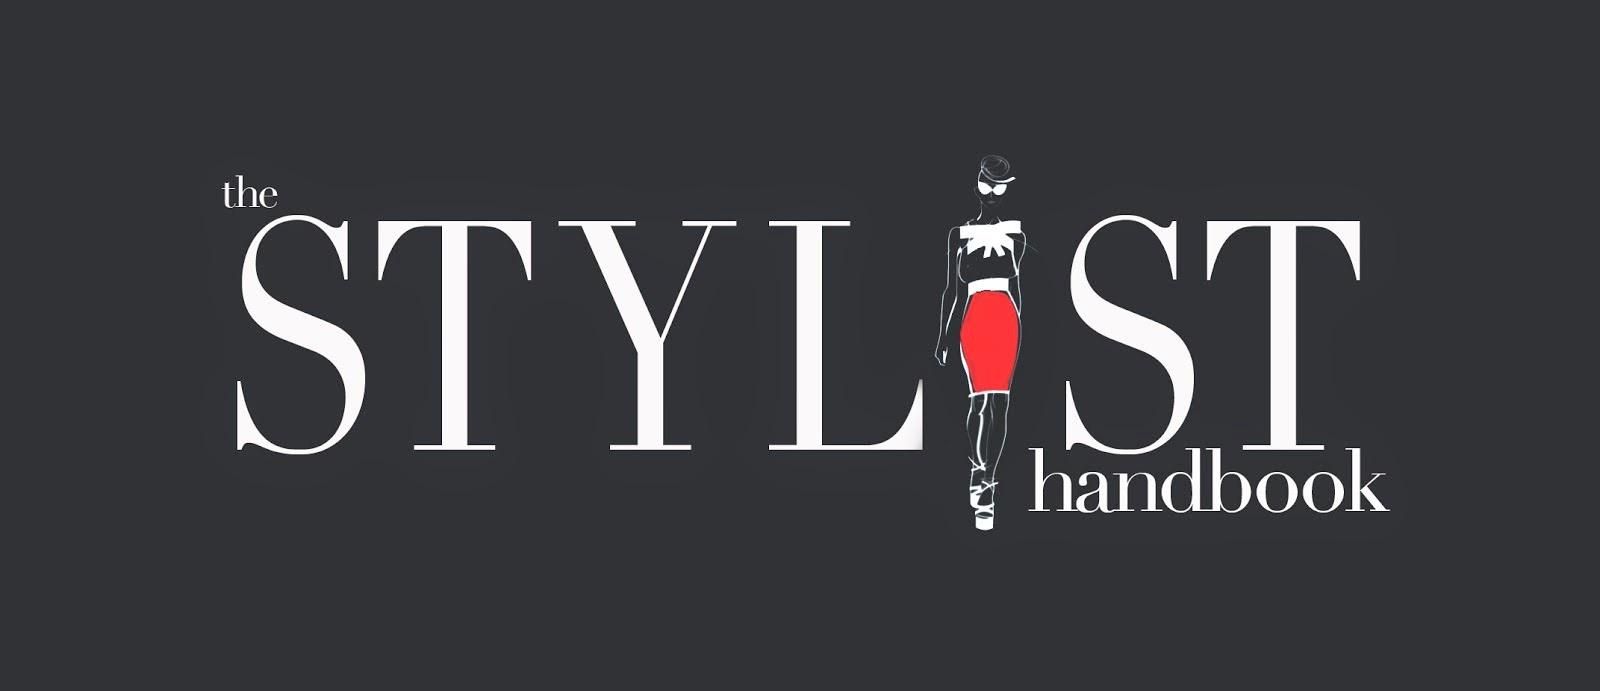 The Stylist Handbook